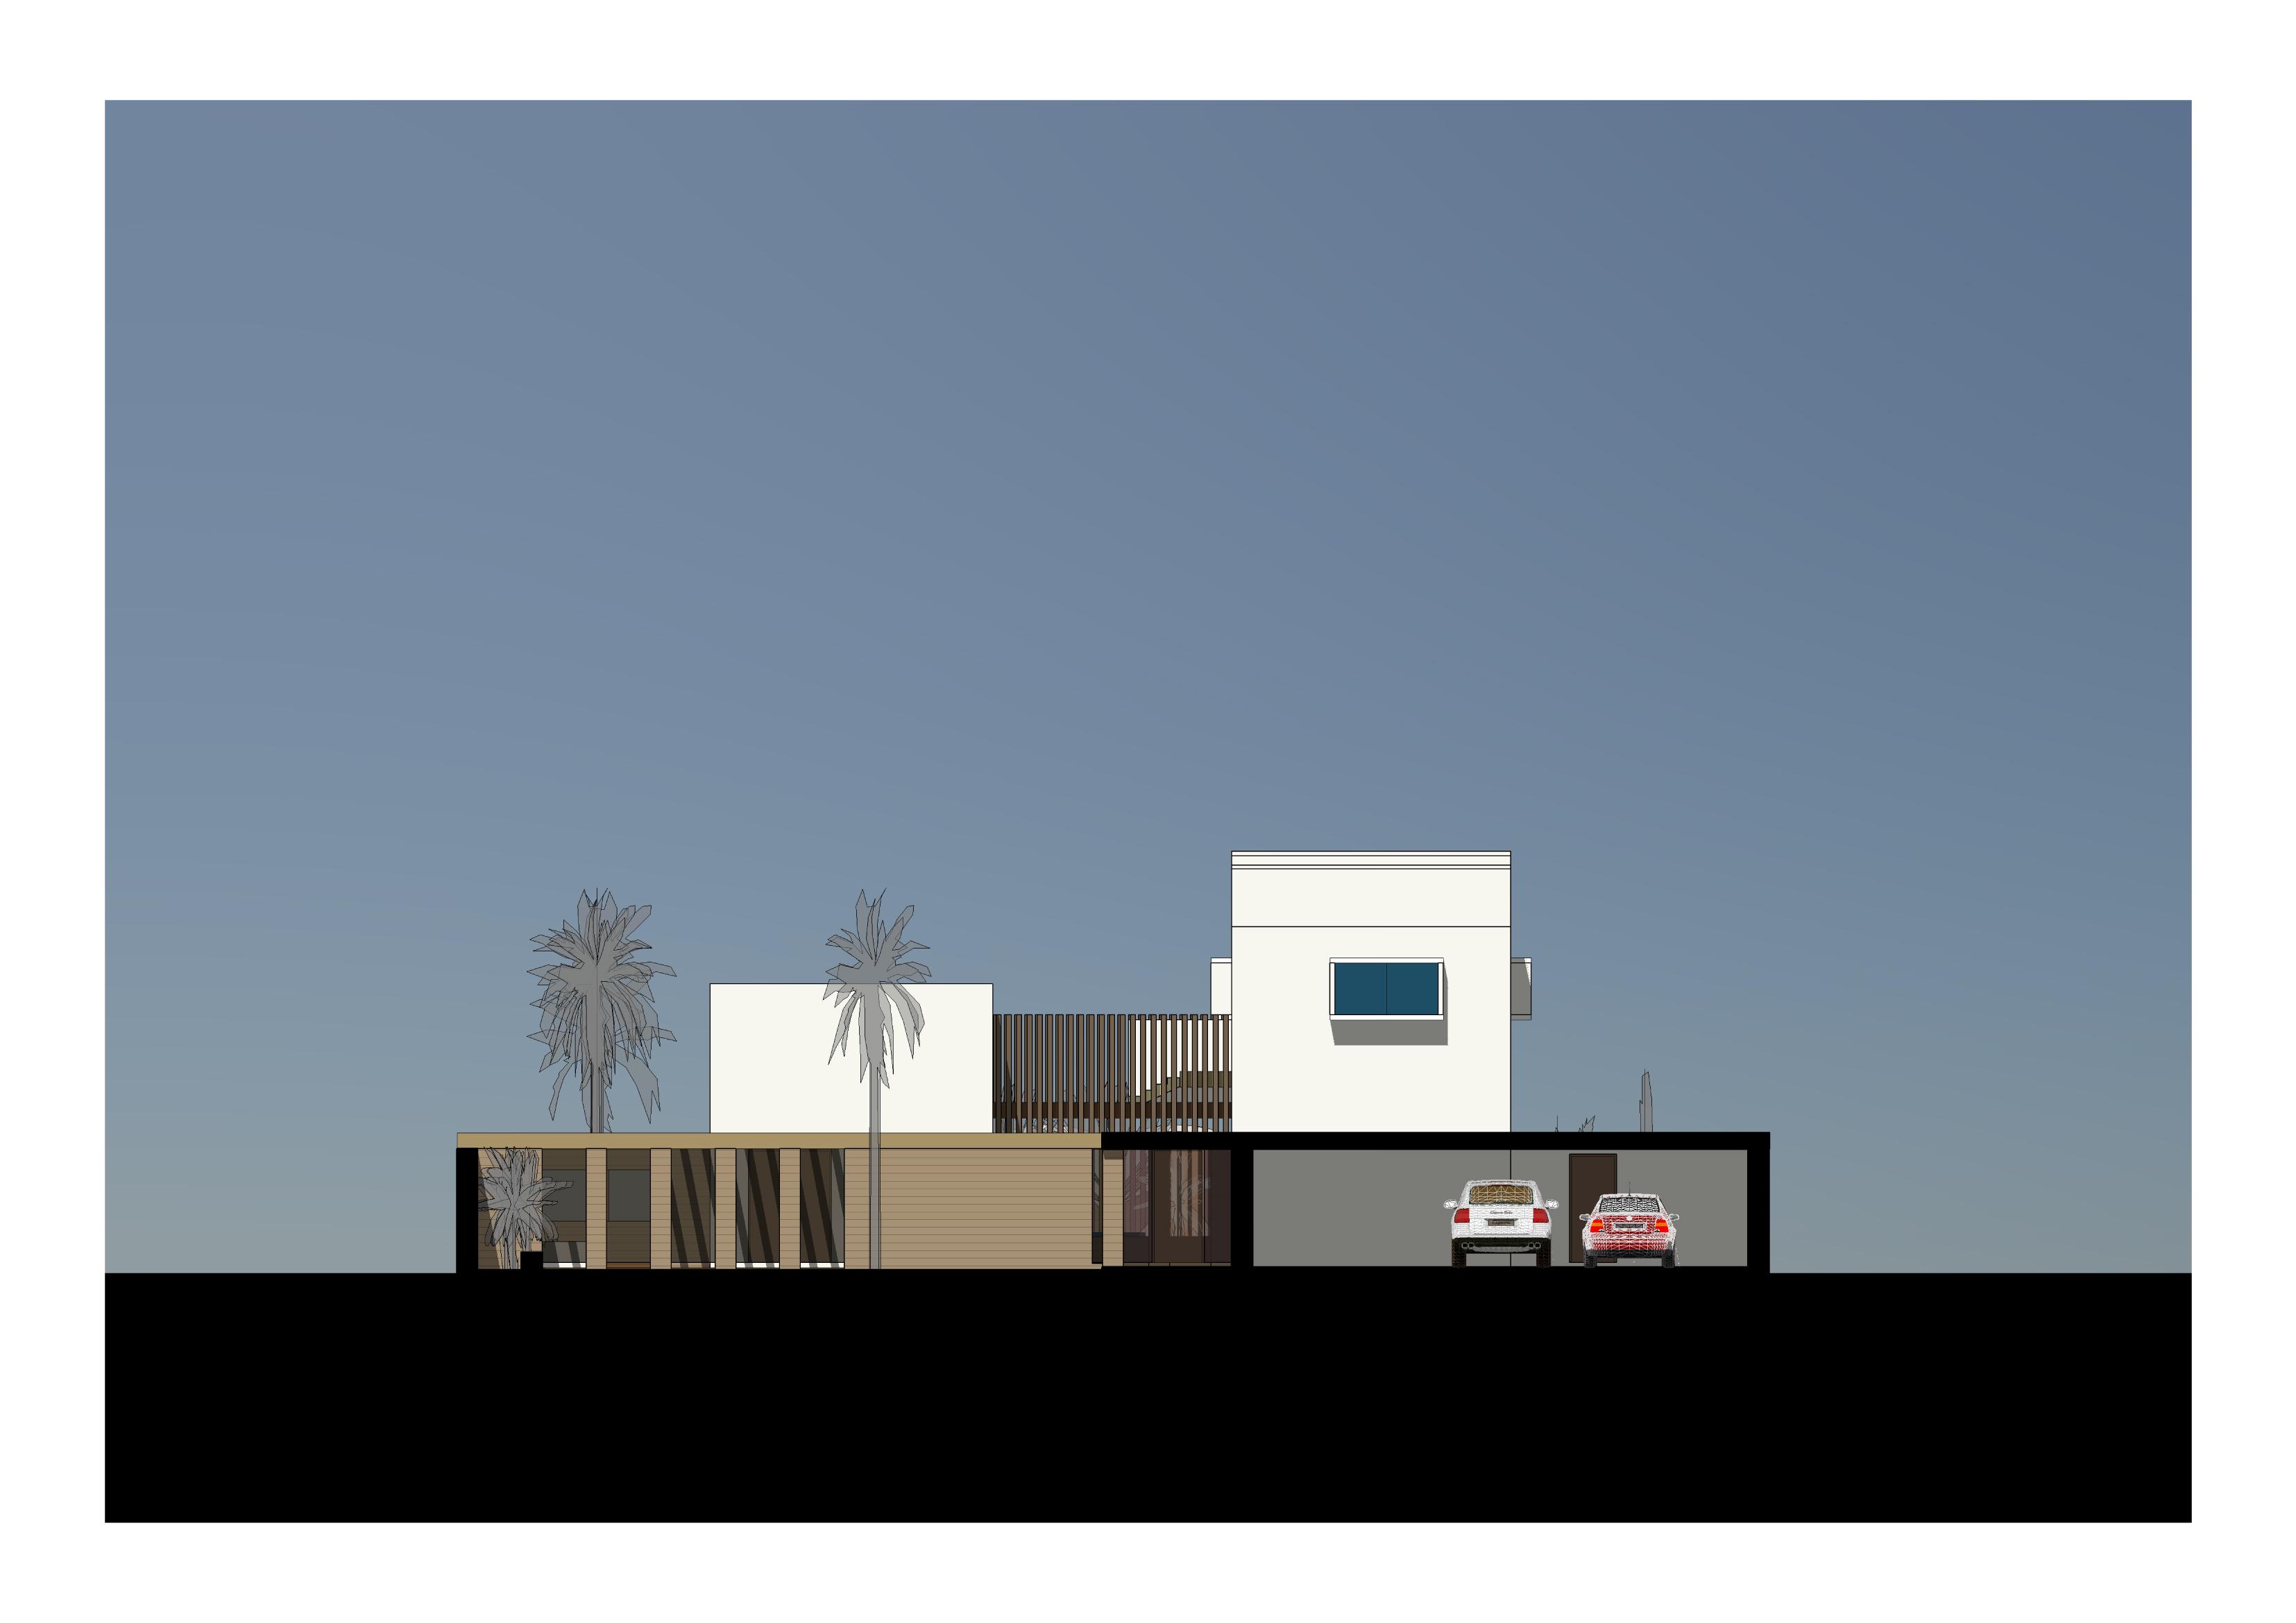 Street elevation of property